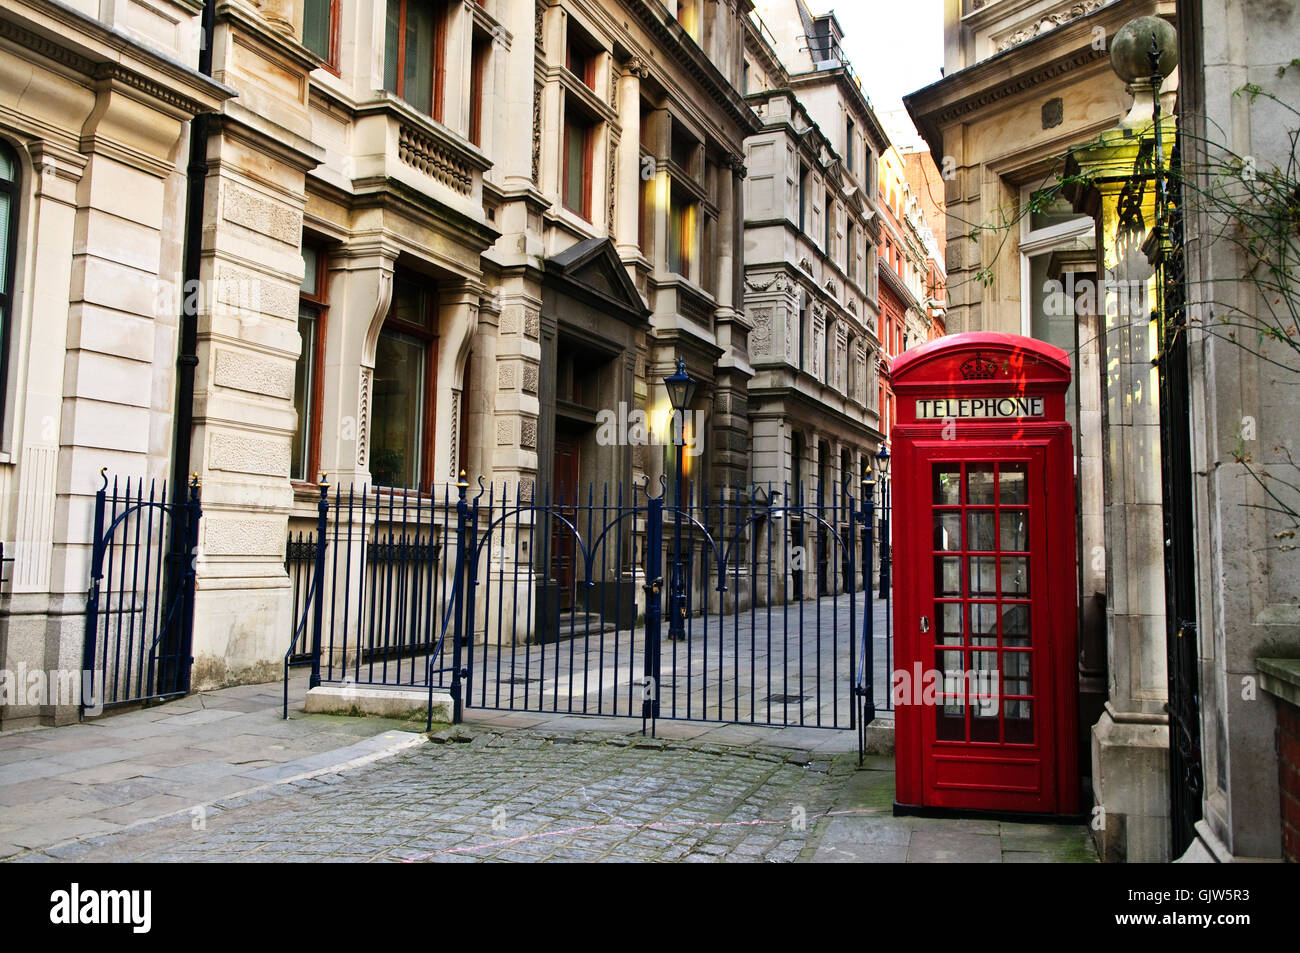 telephone phone london - Stock Image